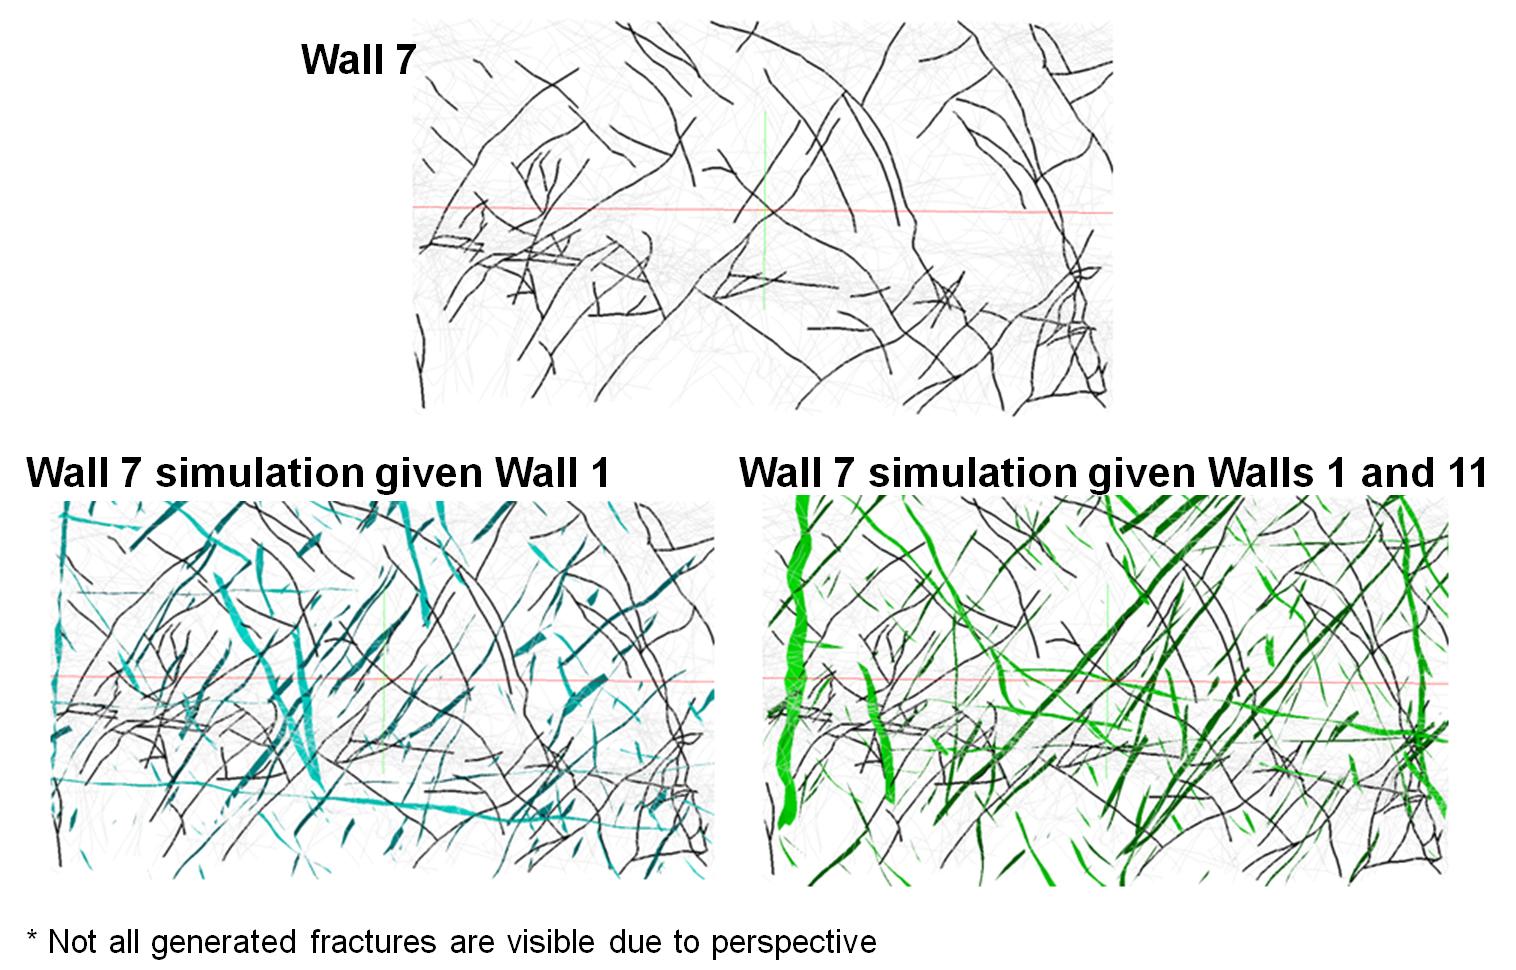 MOFRAC discrete fracture network modeling software